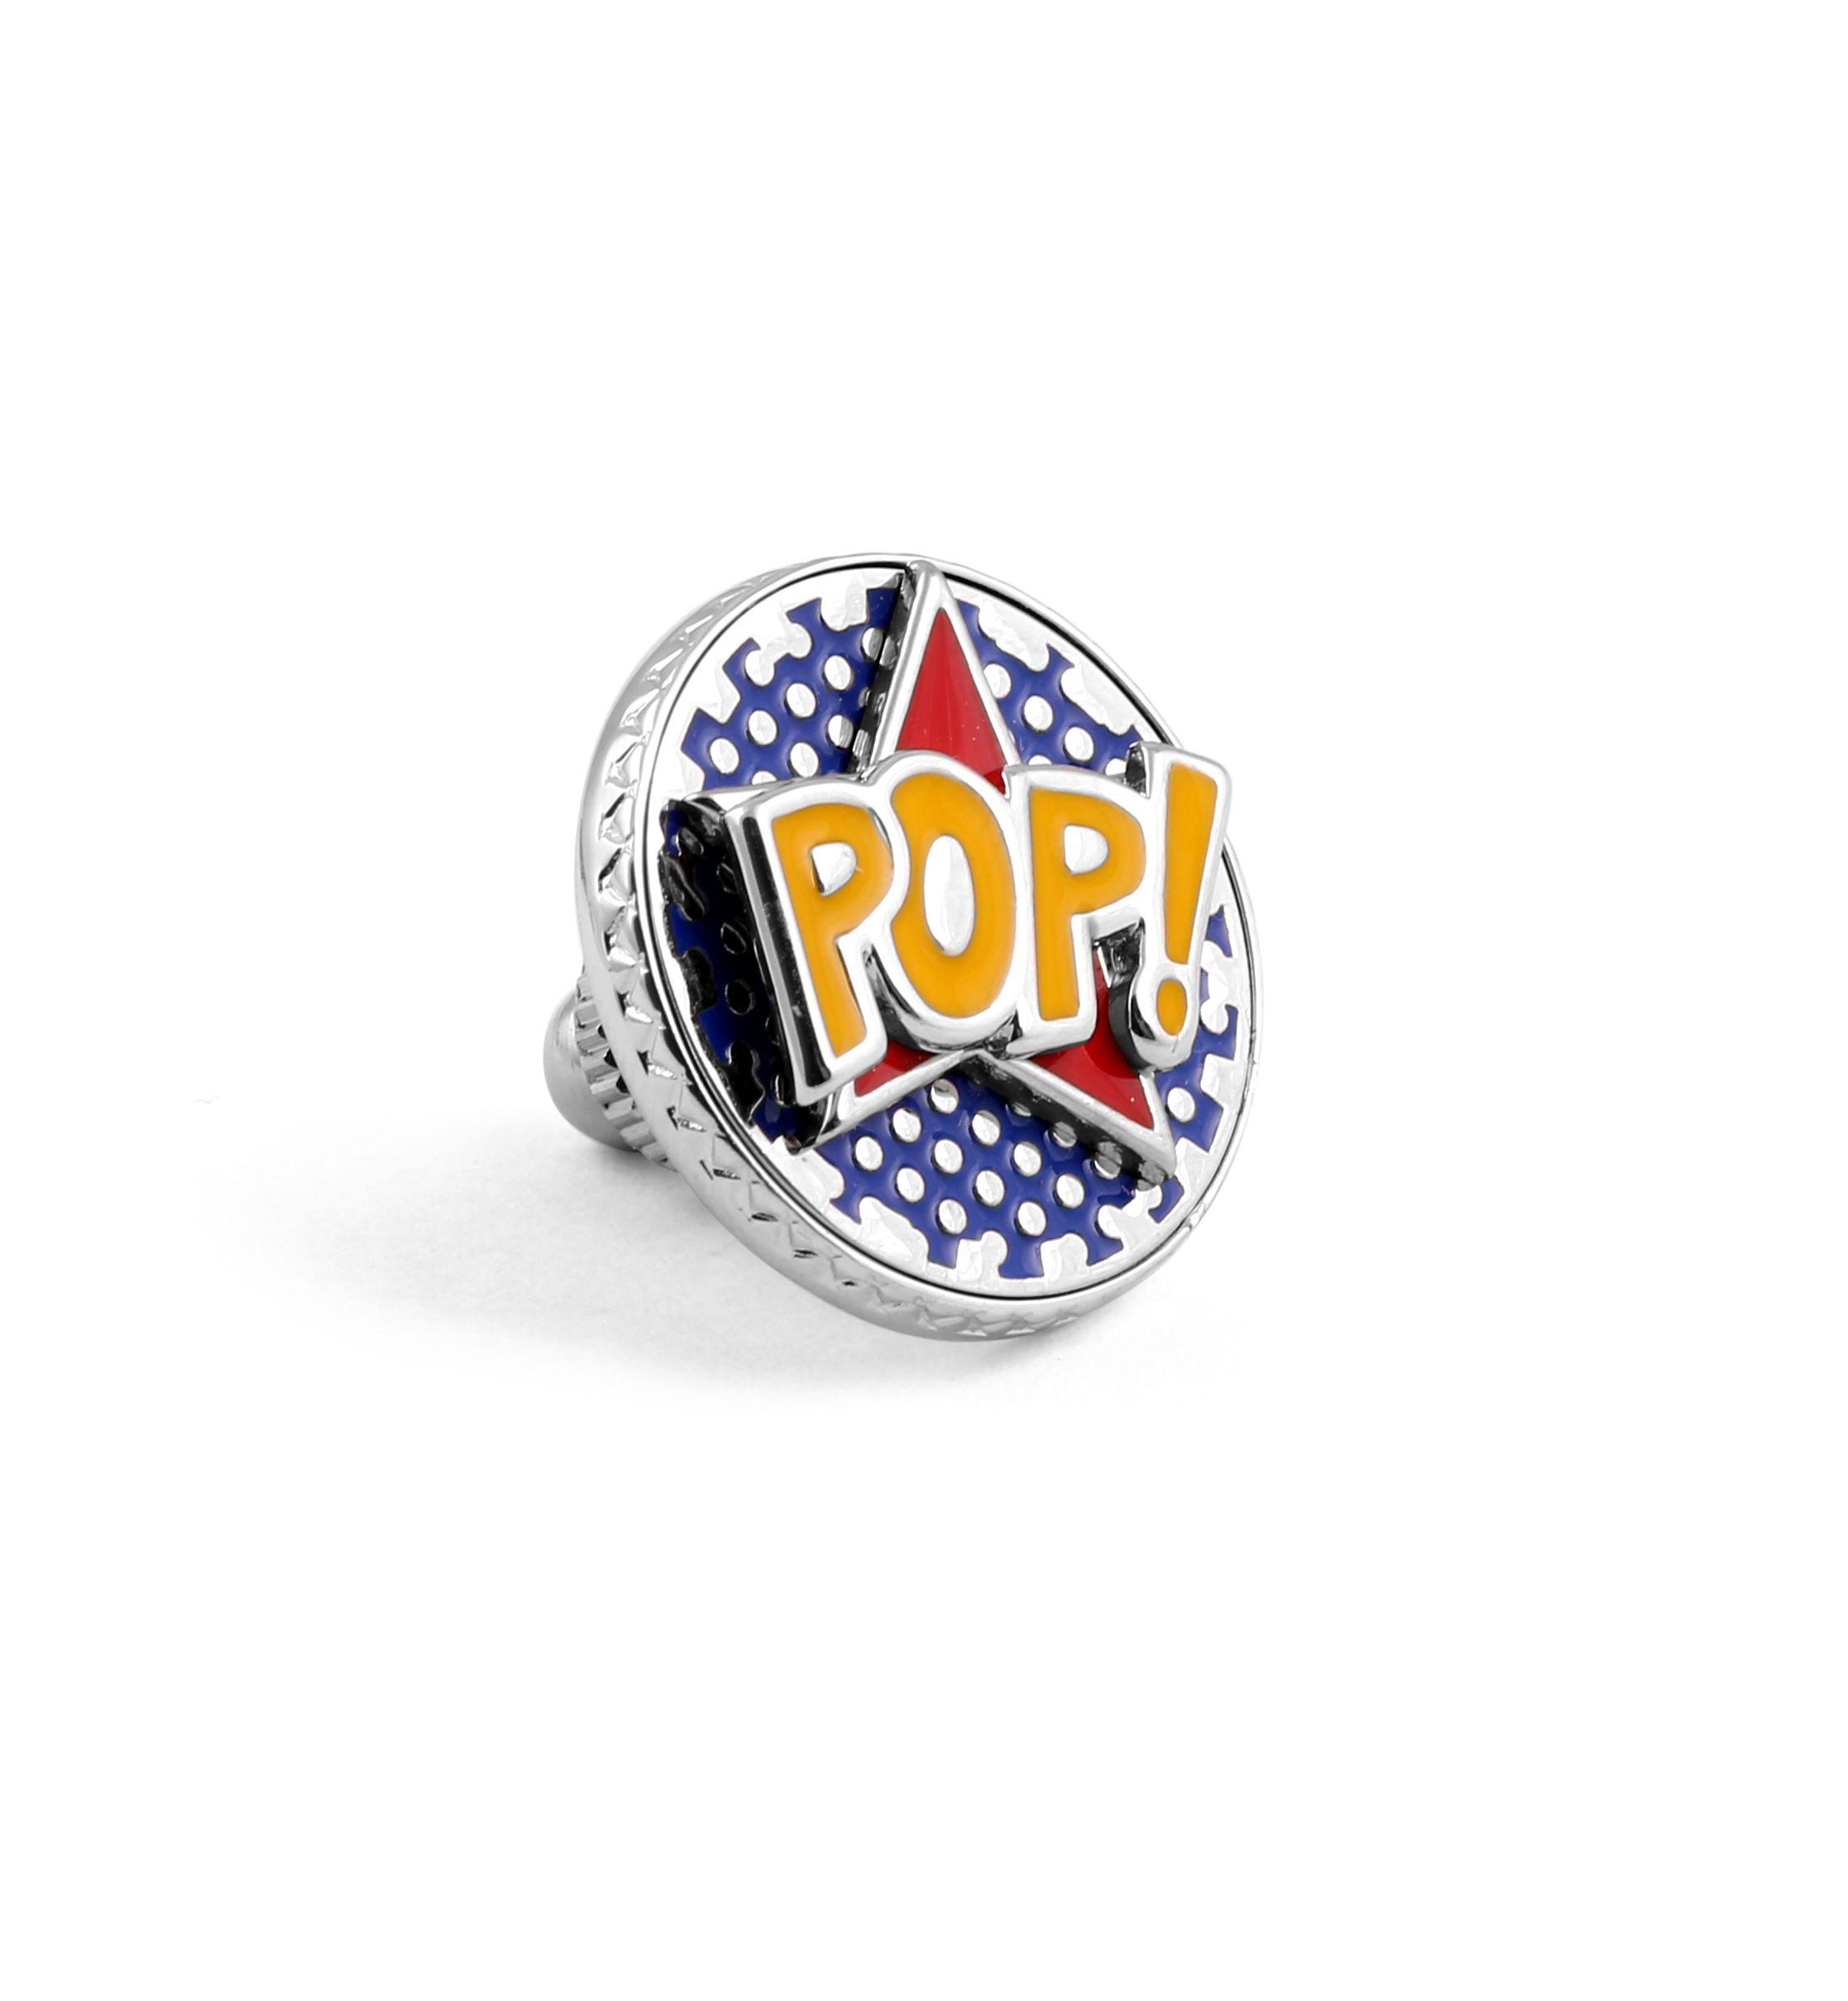 POP Comics style cufflink